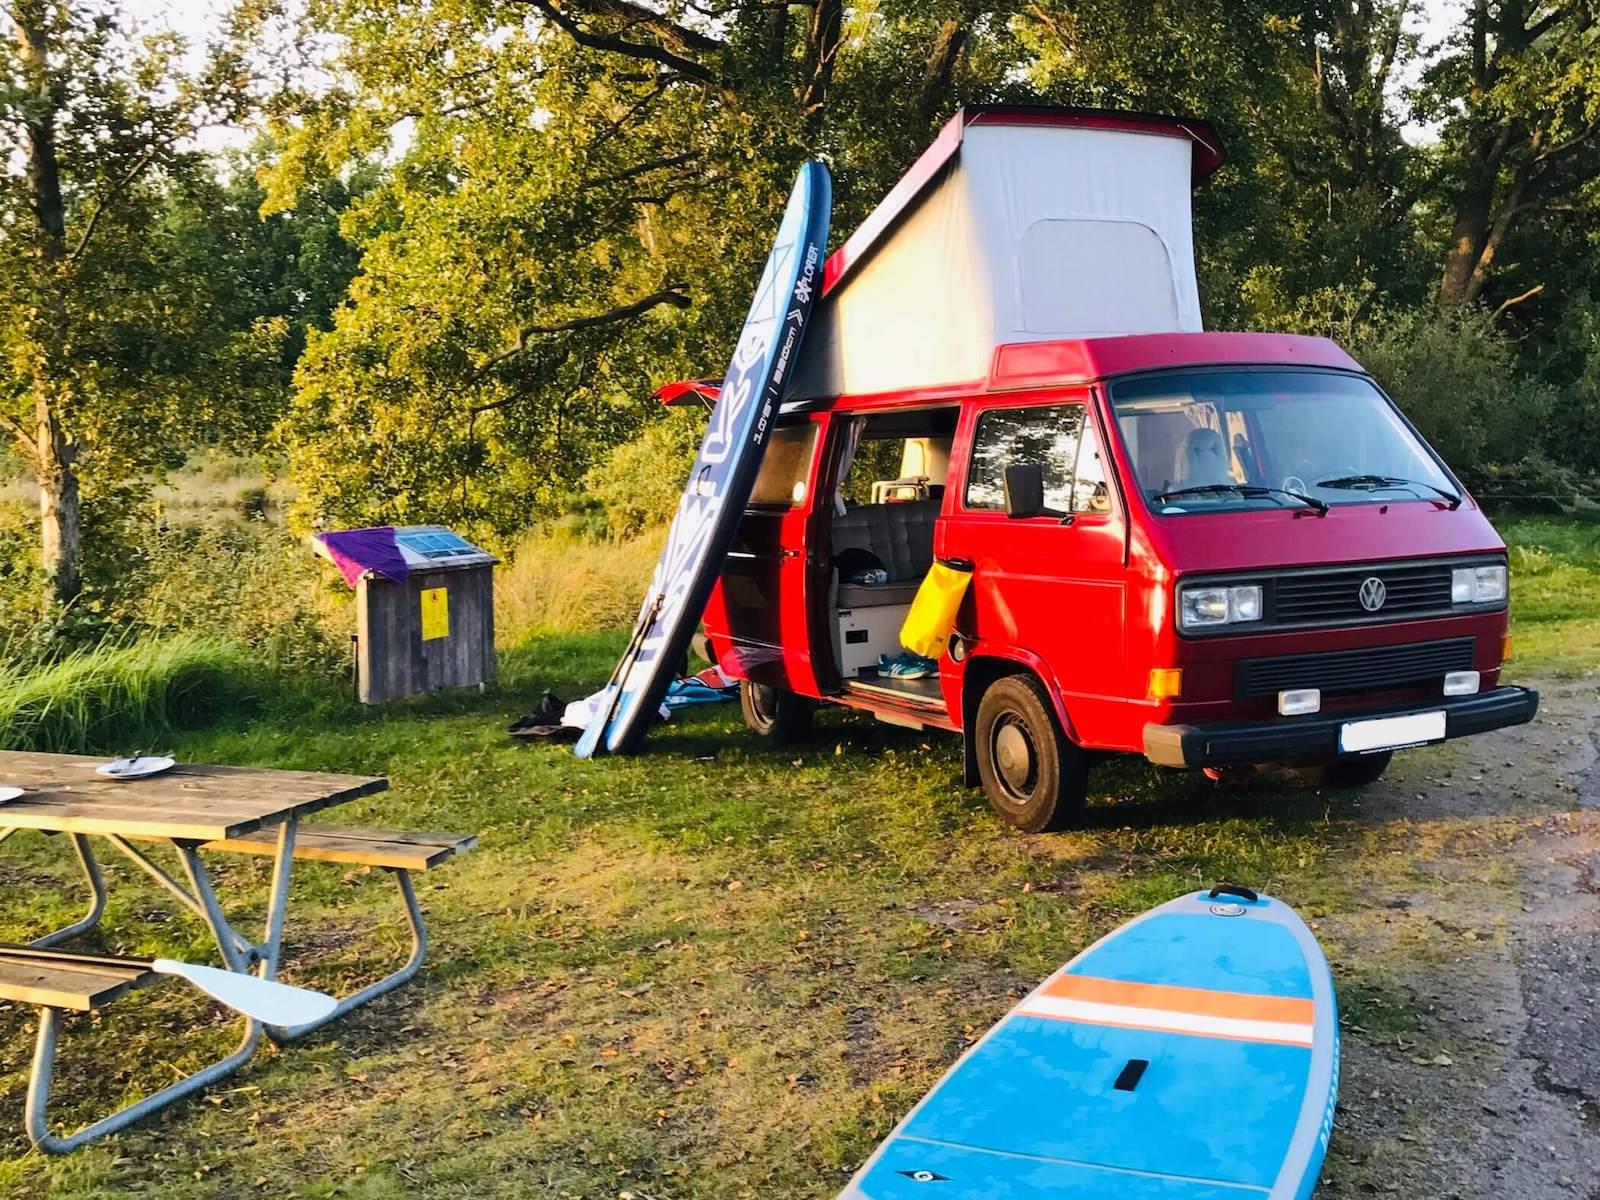 VW Bus T3 Wilma Westfalia Joker Klappdach rot Camper Bulli mieten Rostock bincampen SUP Standuppaddle Schweden outdoor